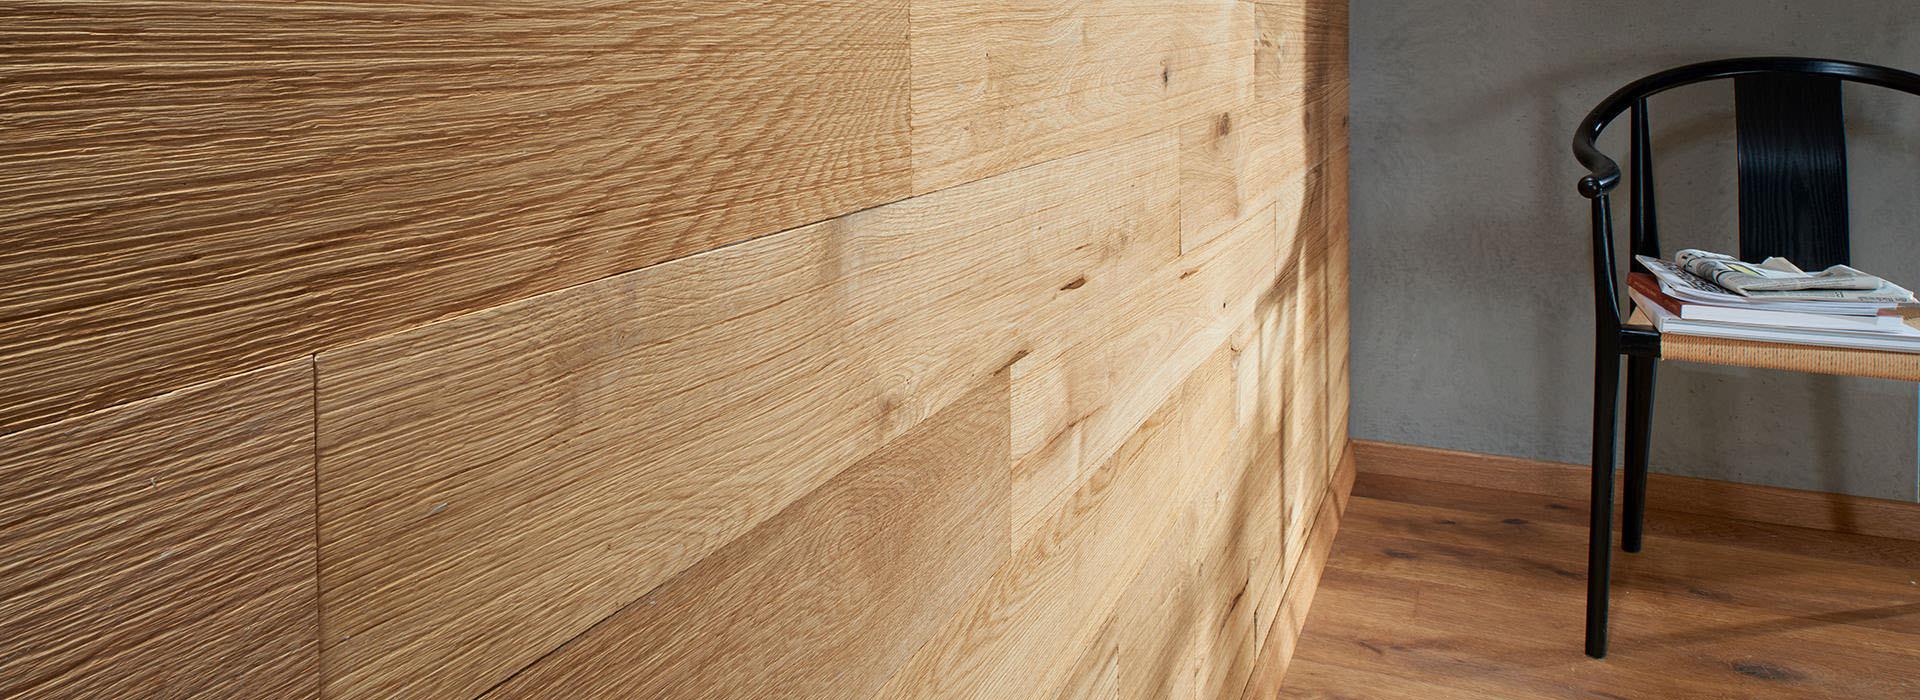 Haro Wall Wandverkleidung Wandverkleidung Aus Holz